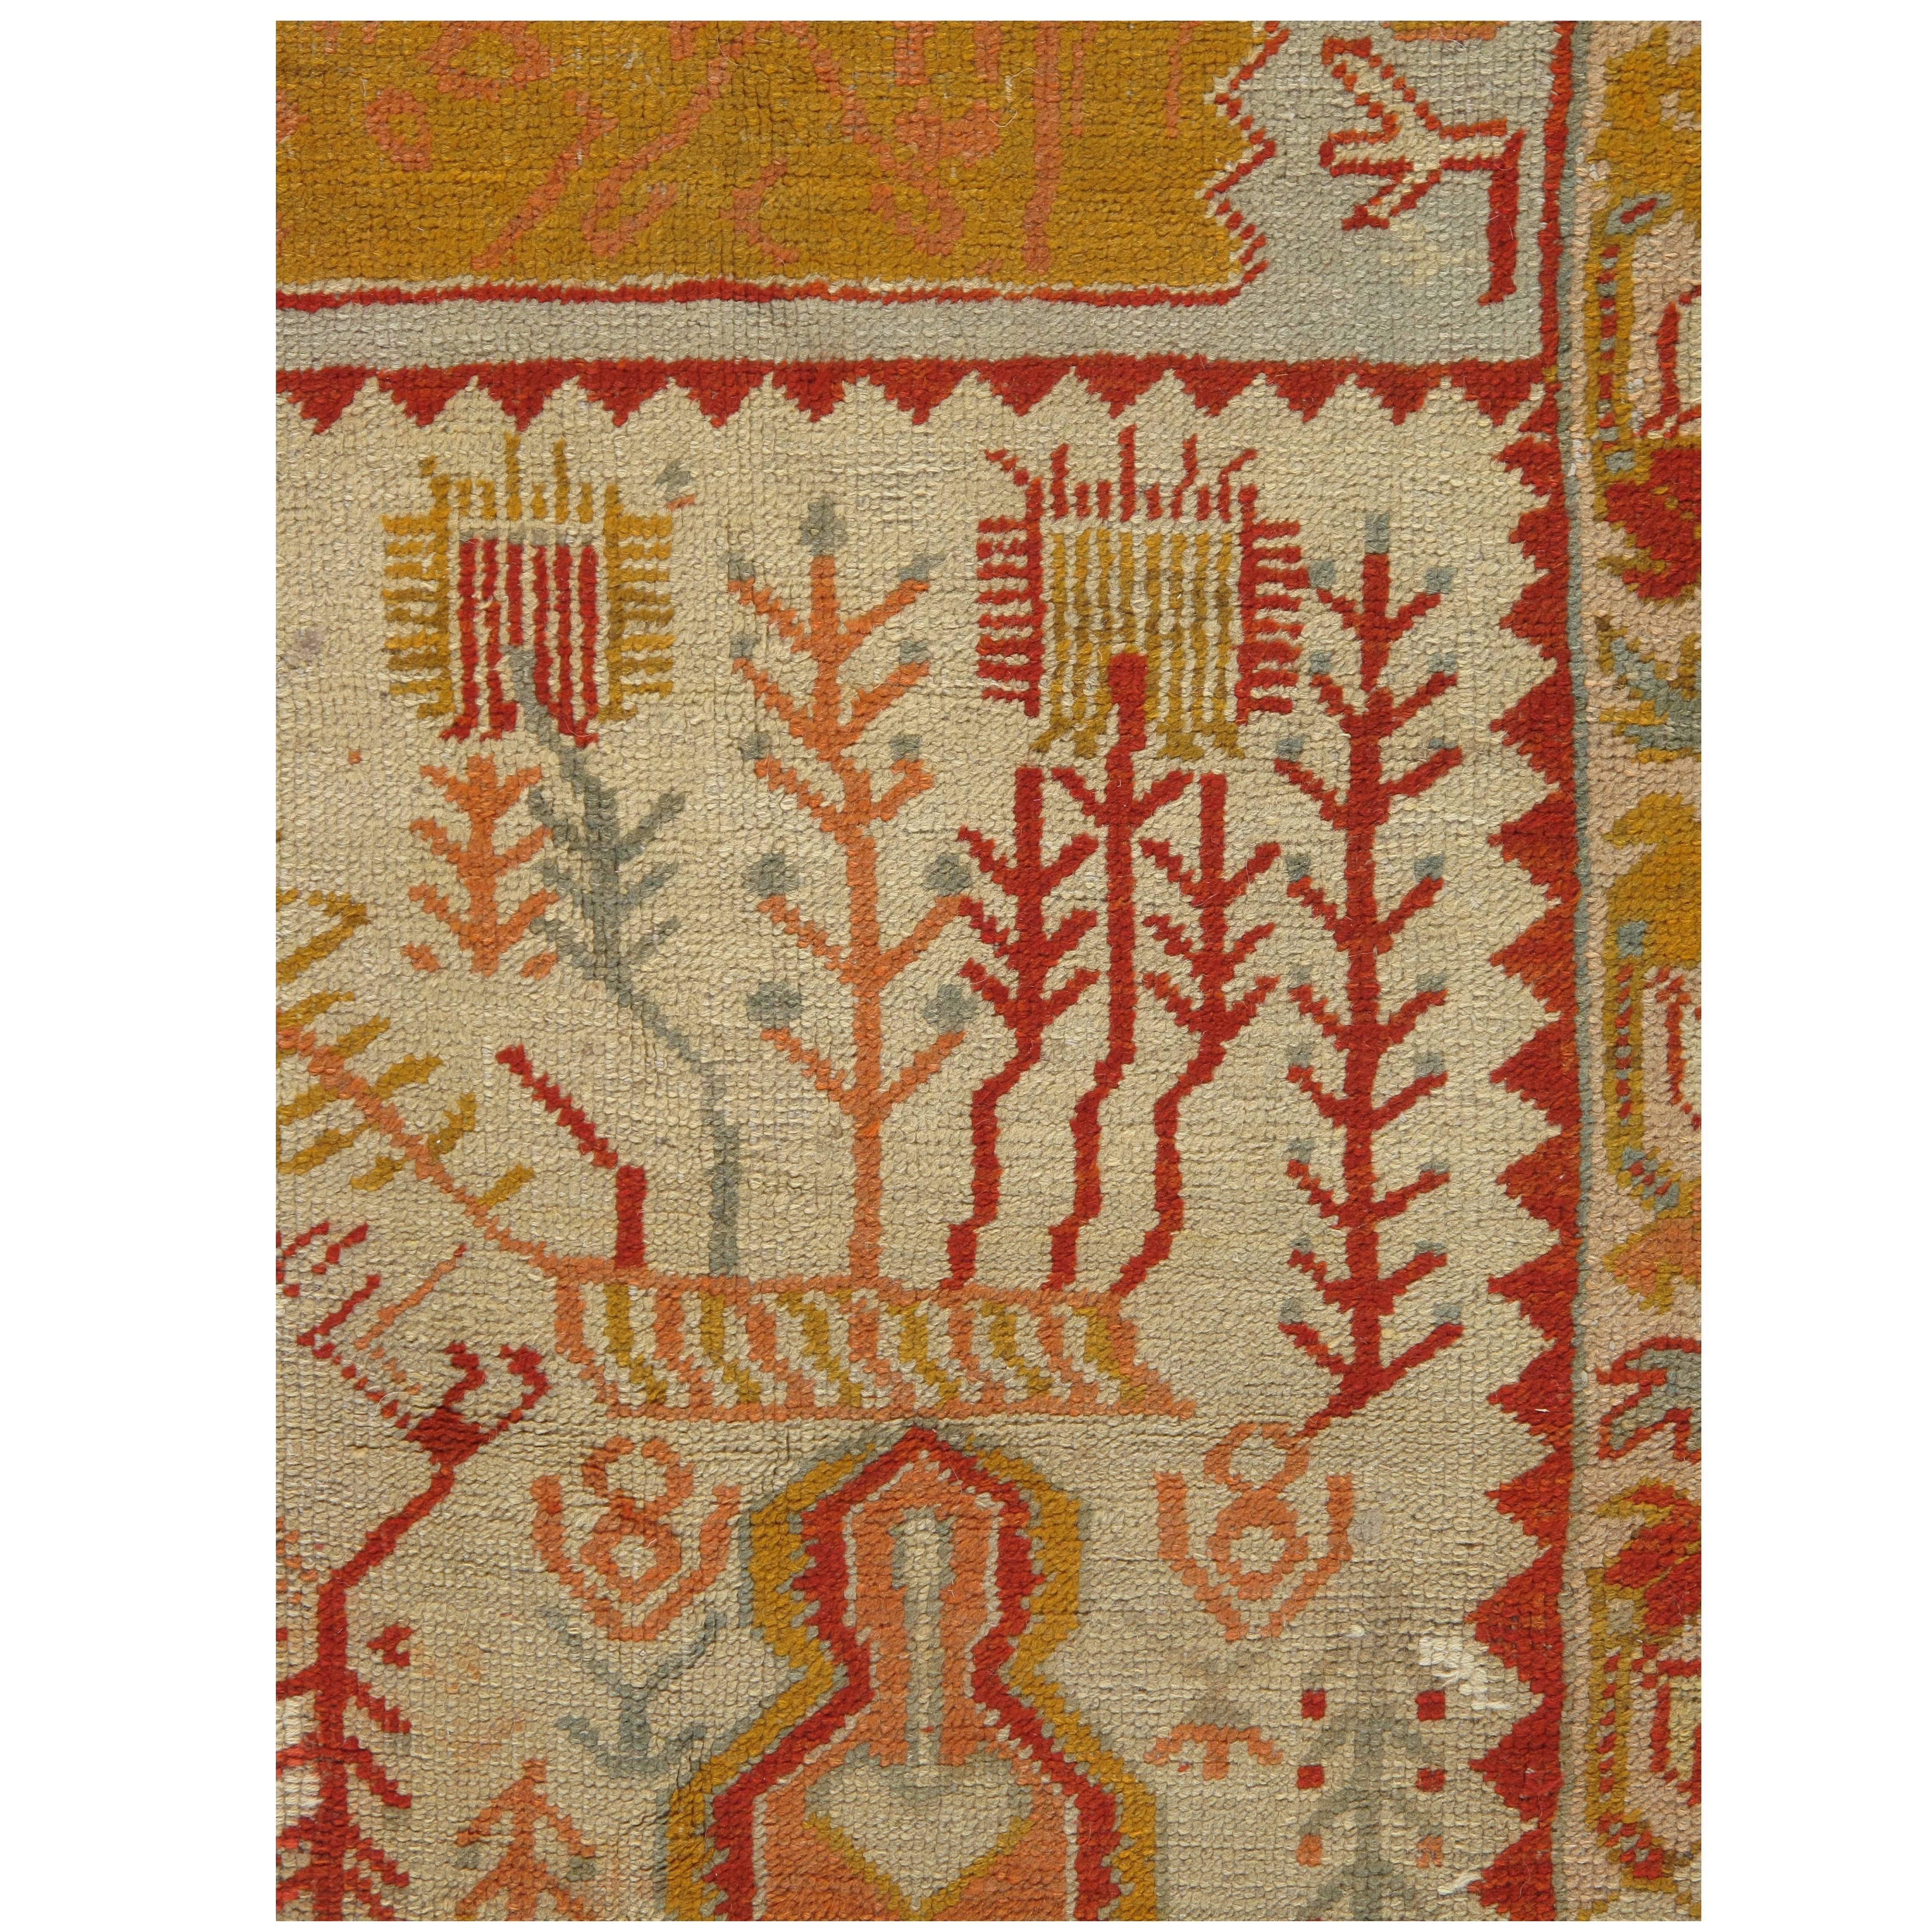 Palace Size Antique Oushak Carpet Turkish Handmade Oriental Rug